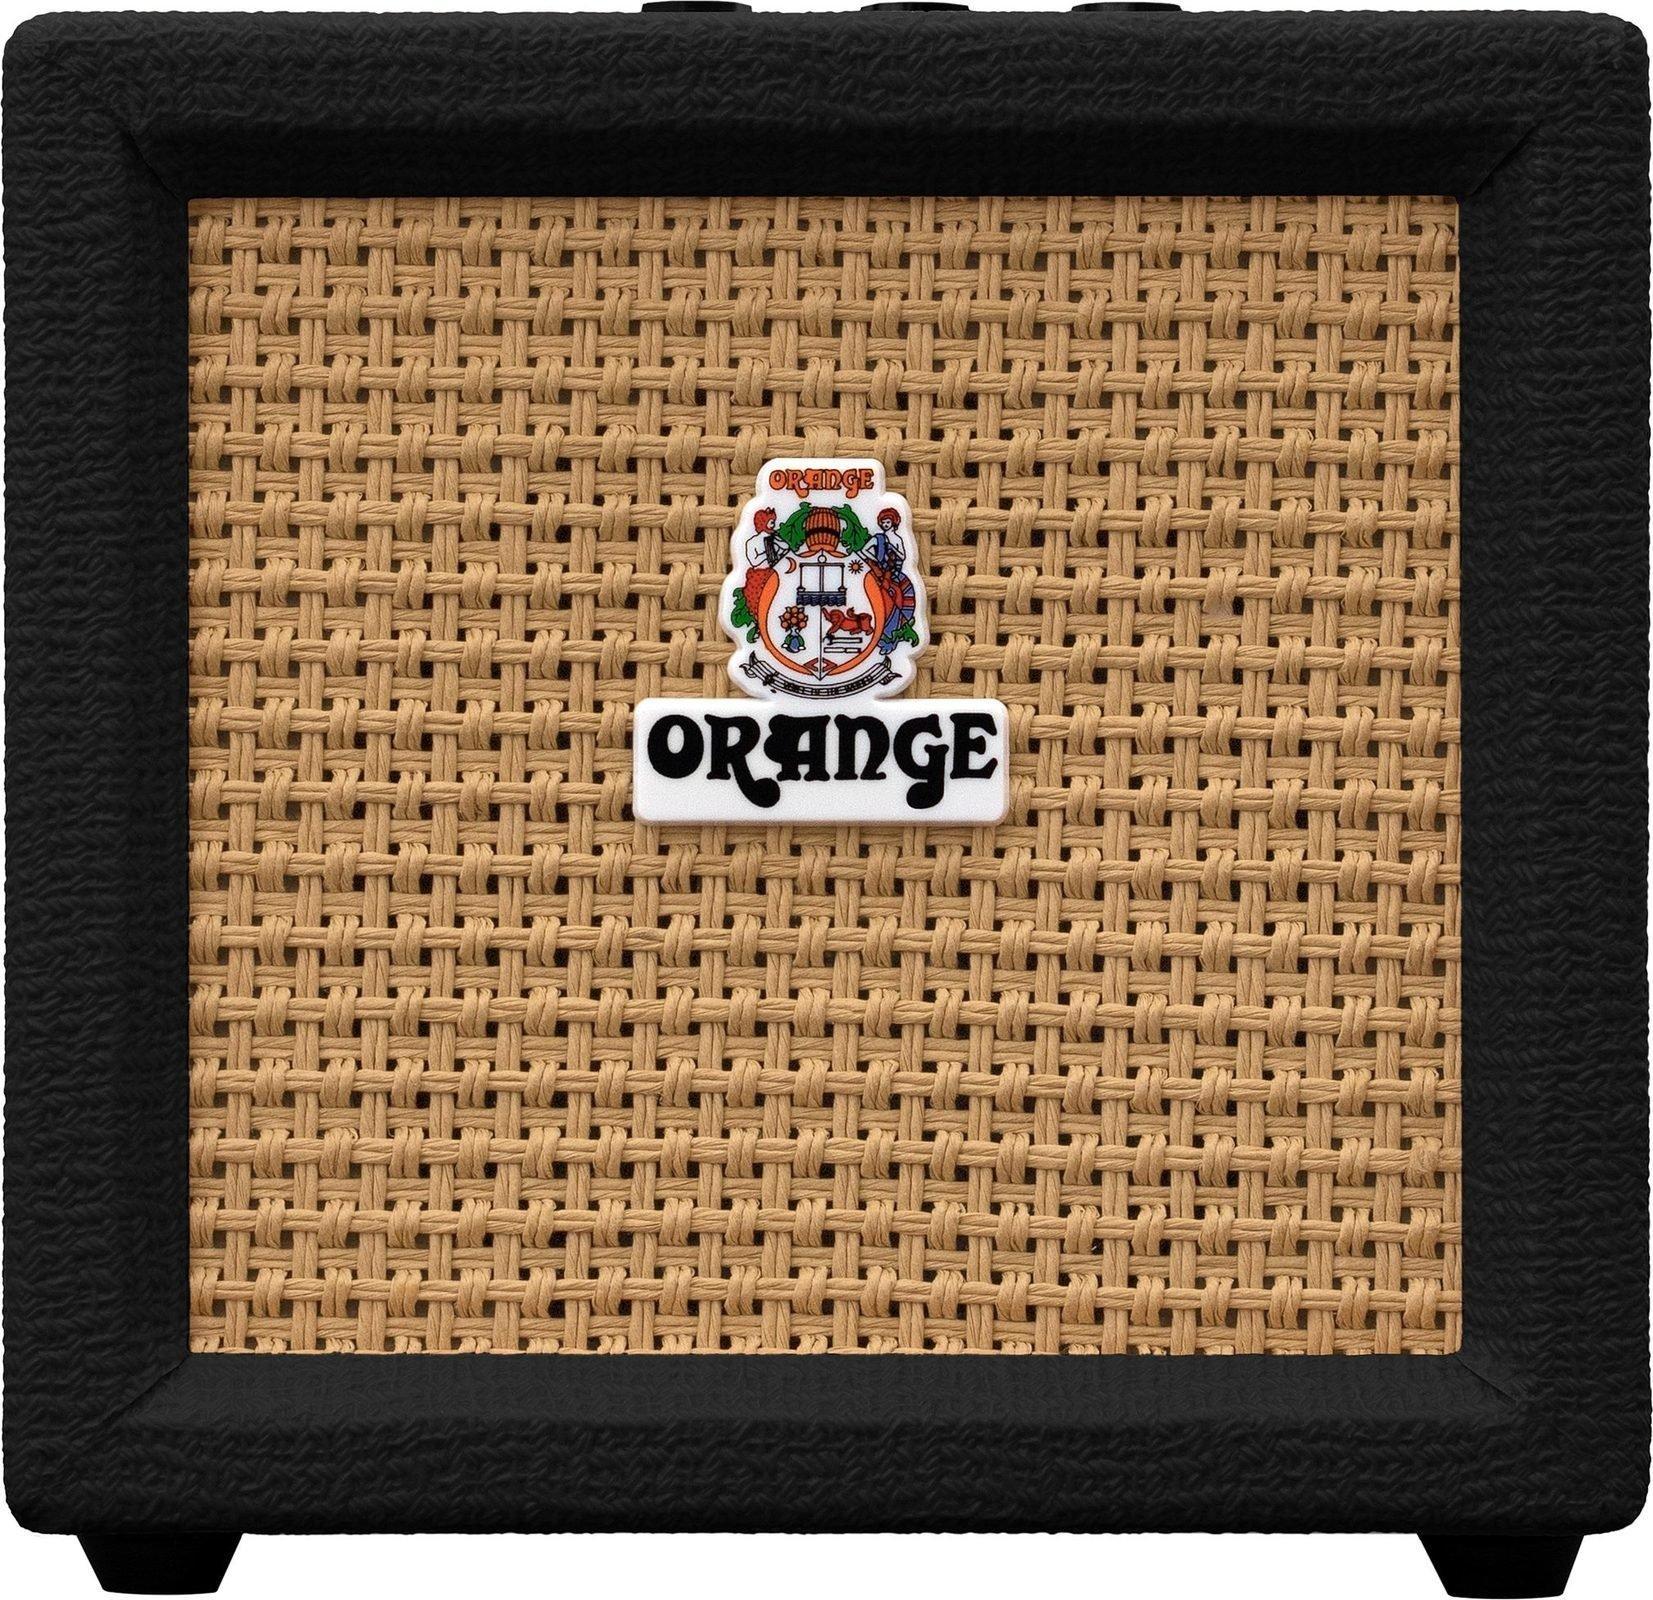 Orange Crush Mini - Combo Verstärker für E-Gitarre 3W batteriebetrieben 9V